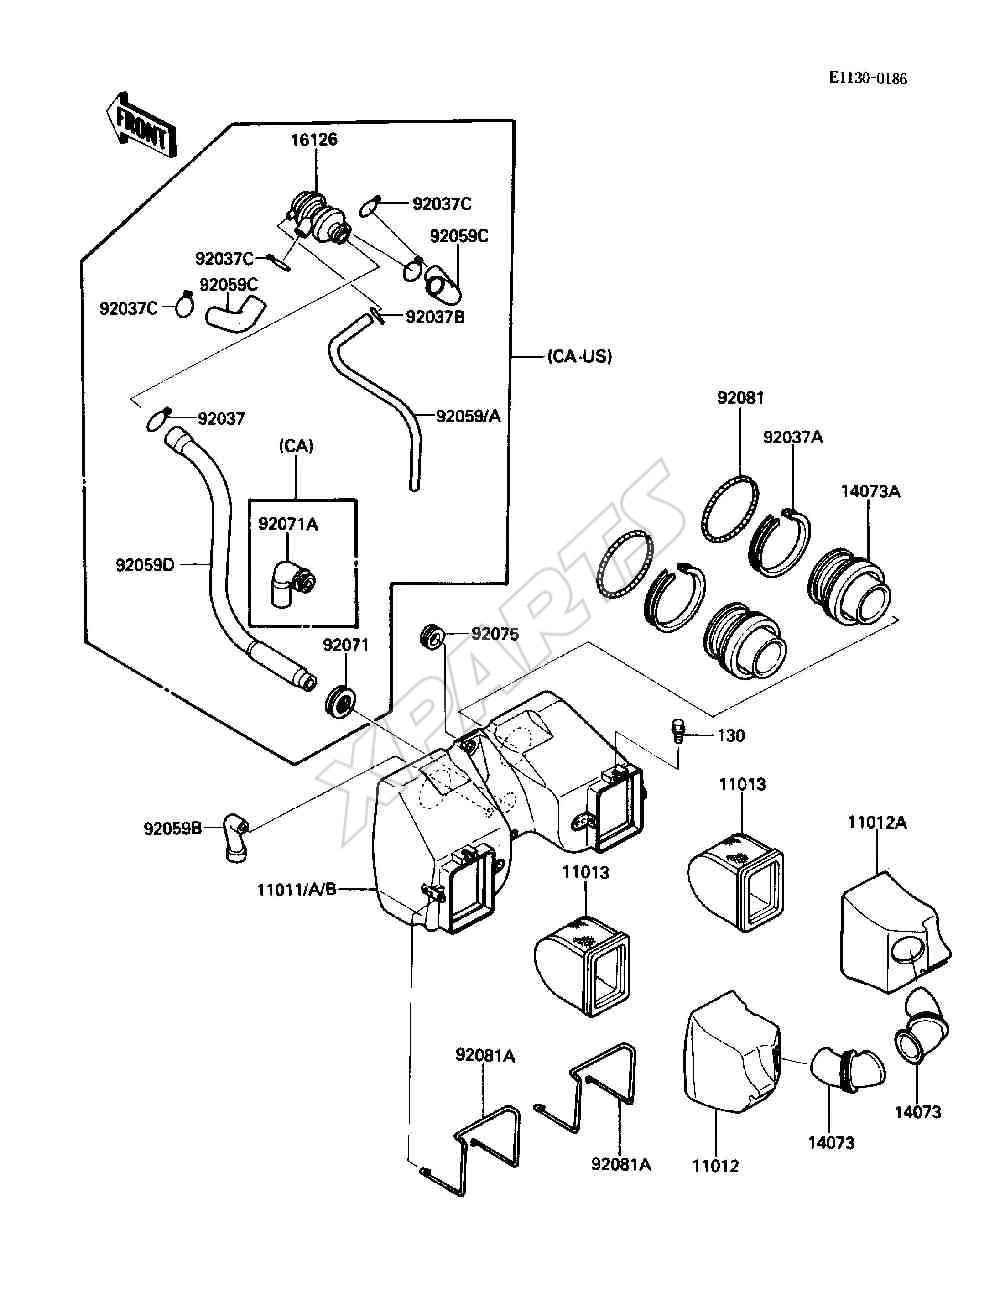 RE_8161] Kawasaki 454 Ltd Fuse Box Download DiagramLave Vell Jebrp Mohammedshrine Librar Wiring 101